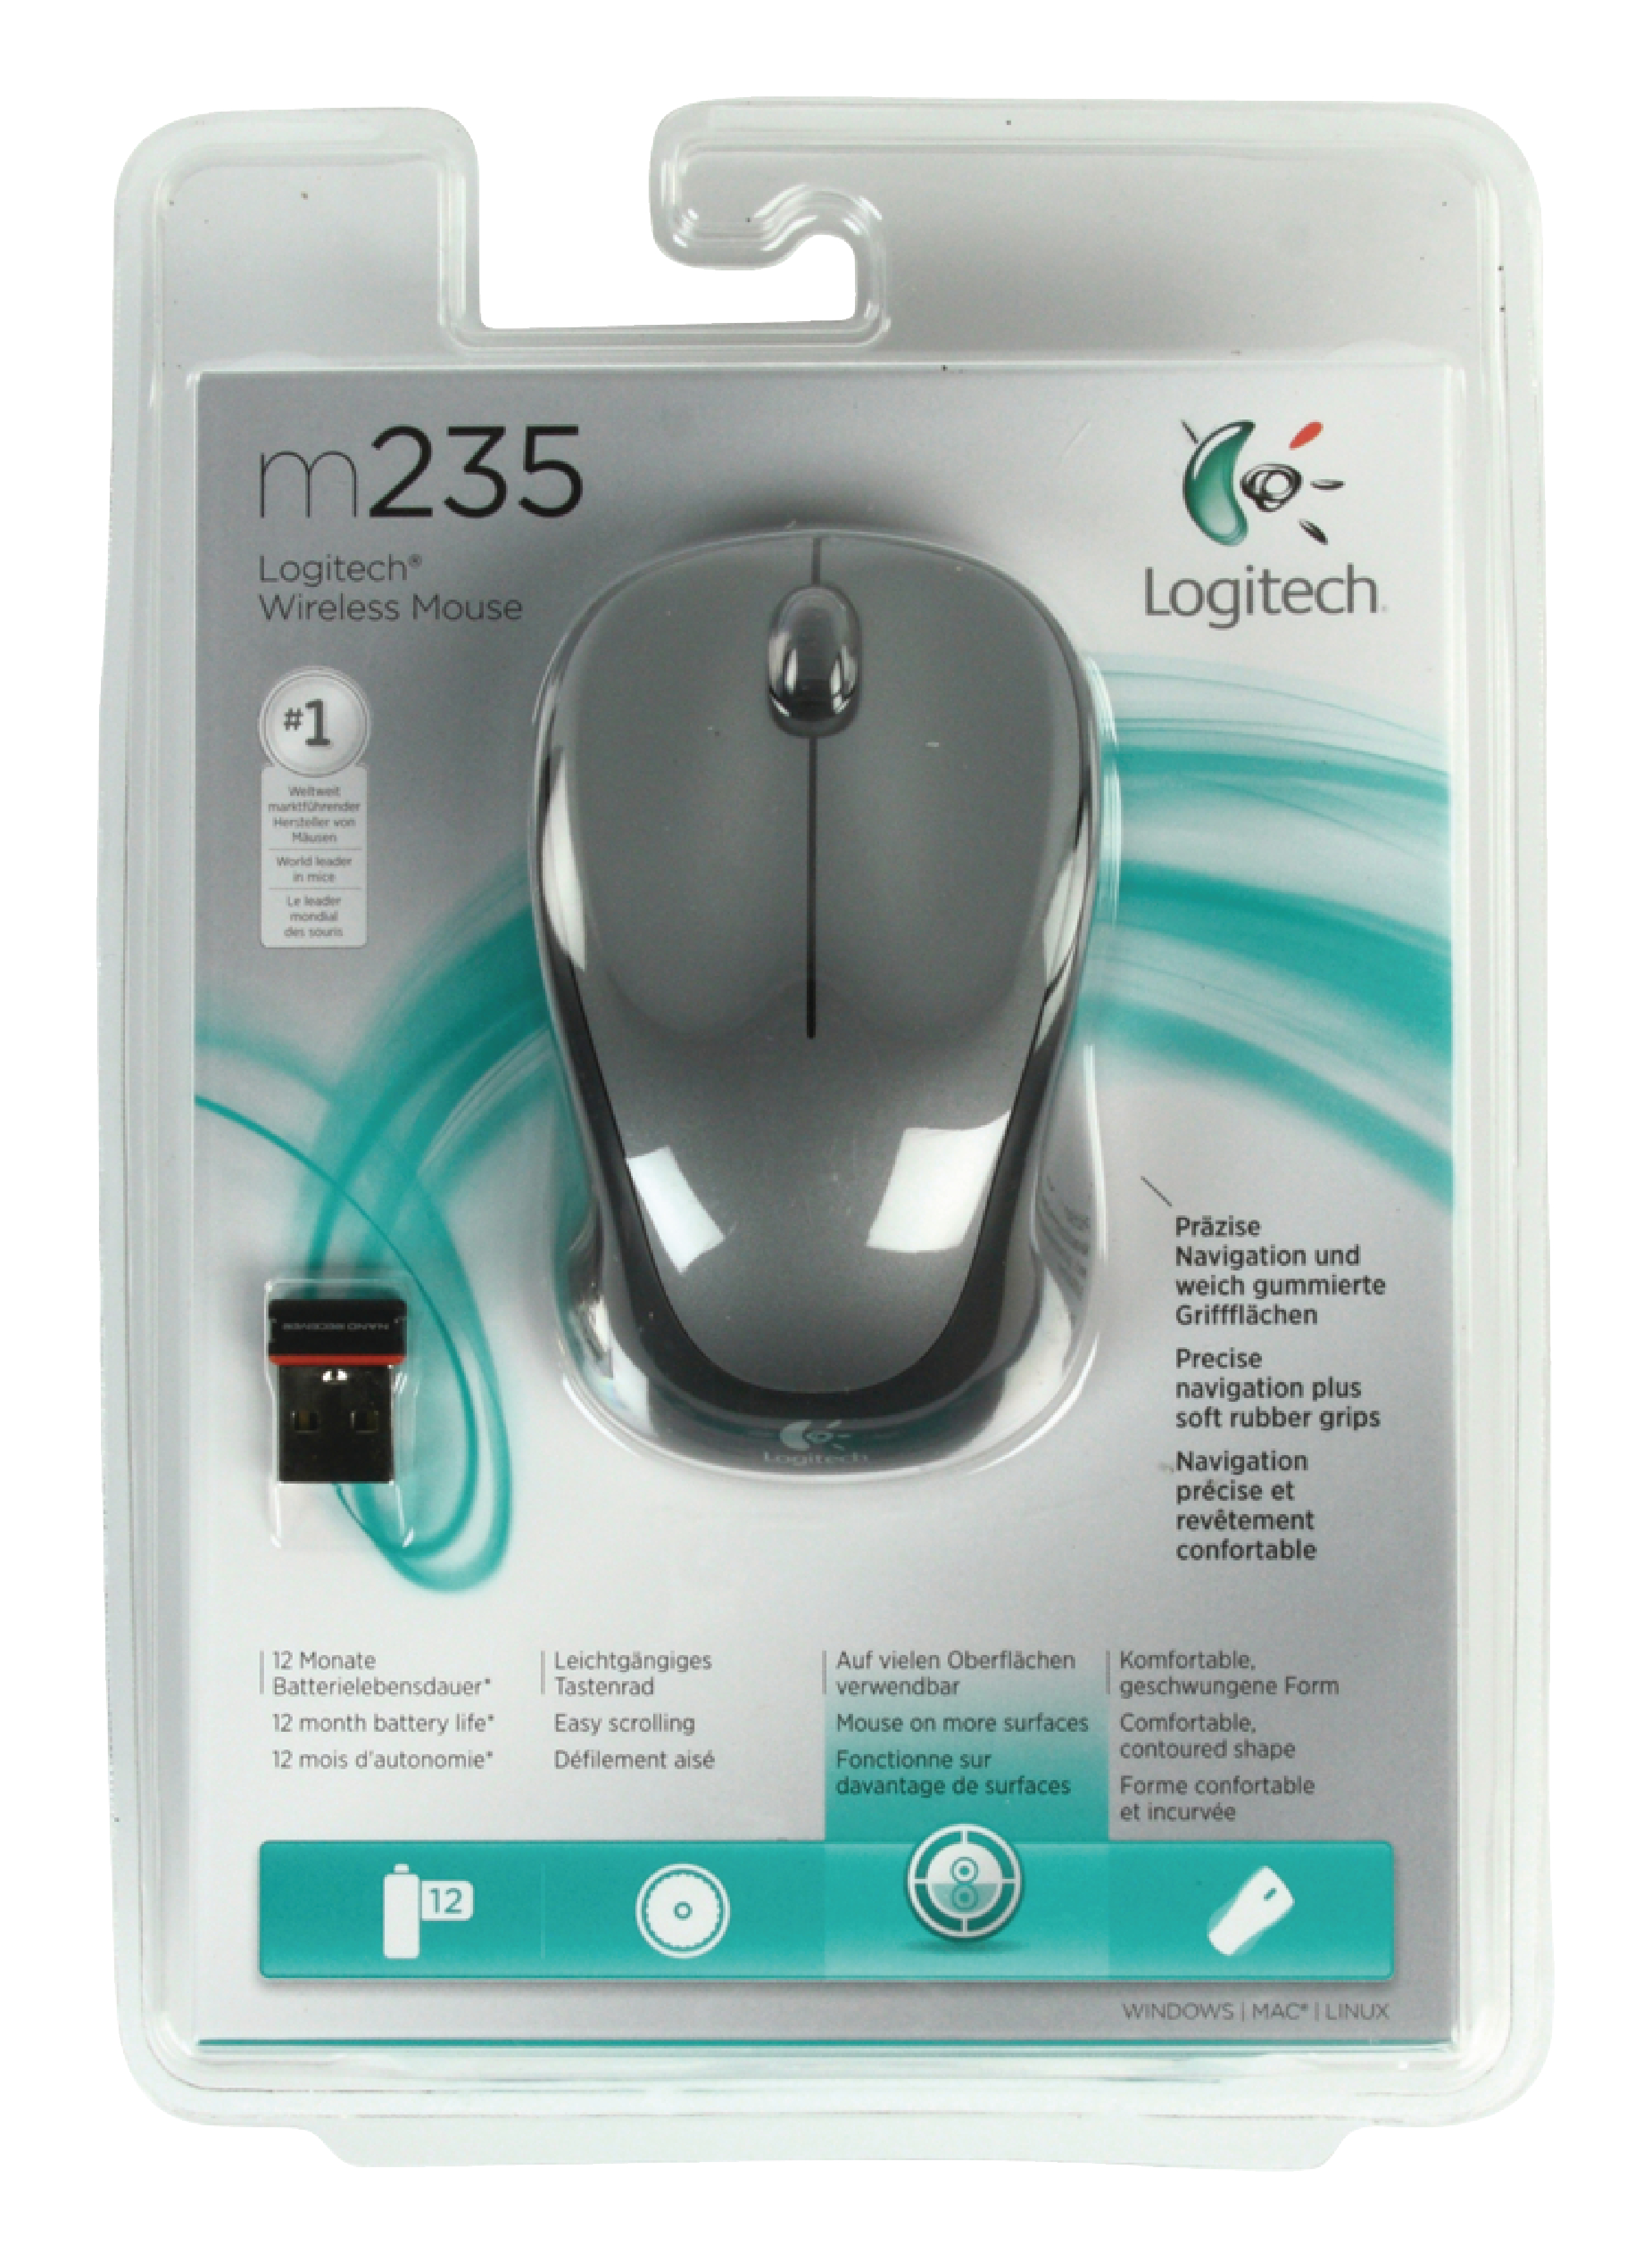 Lgt M235b Logitech Wireless Mouse Desktop 3 Button Grey R One